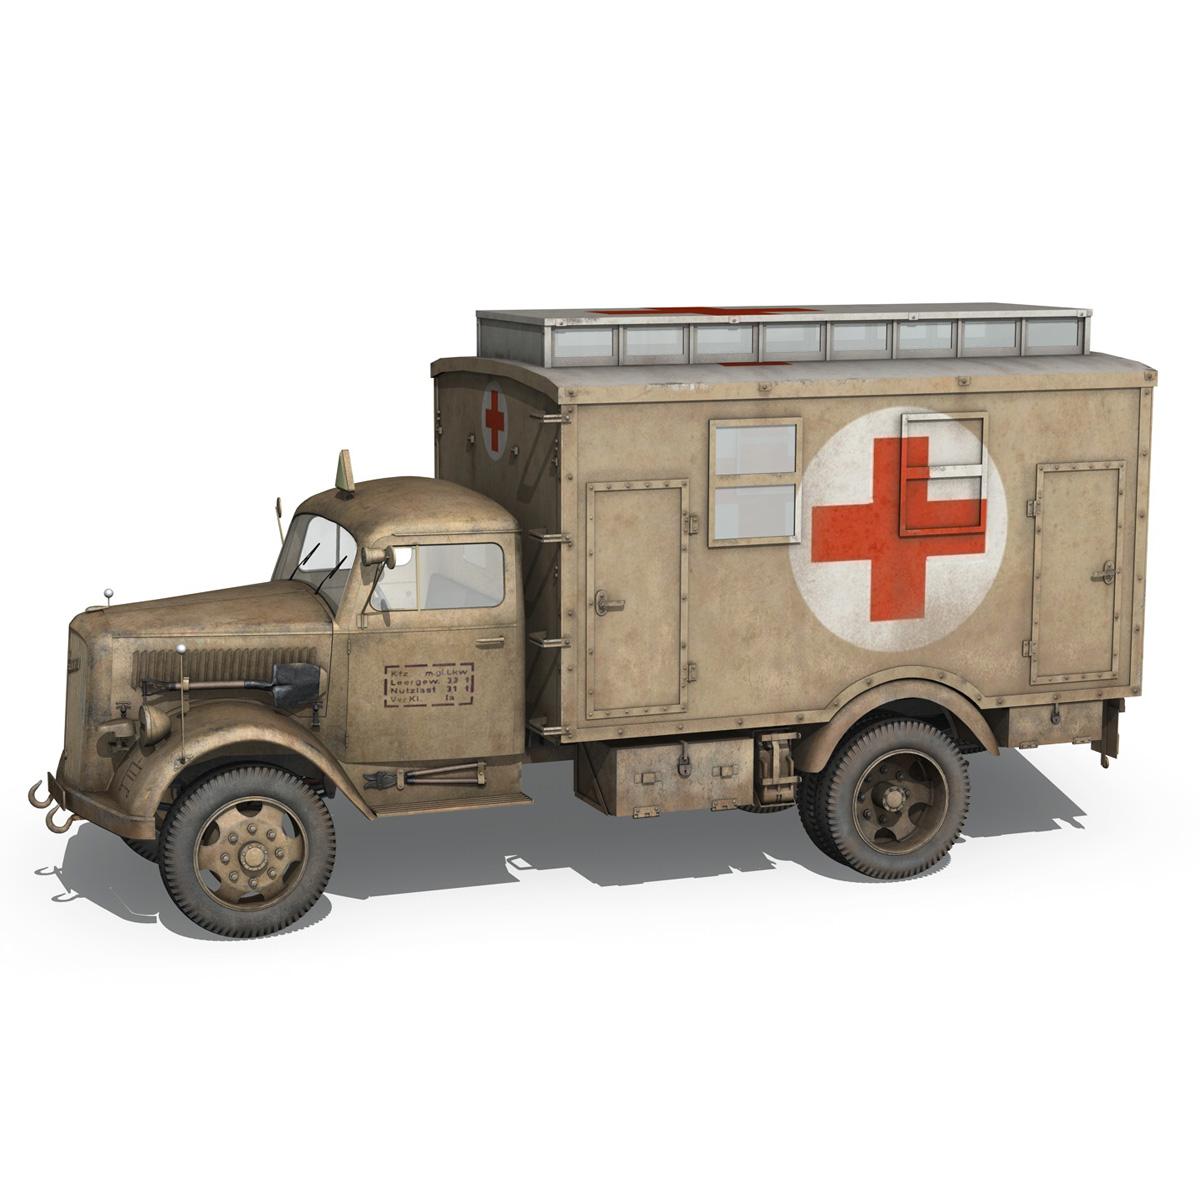 opel blitz – 3t ambulance truck – 2 pzdiv 3d model 3ds c4d fbx lwo lw lws obj 265755